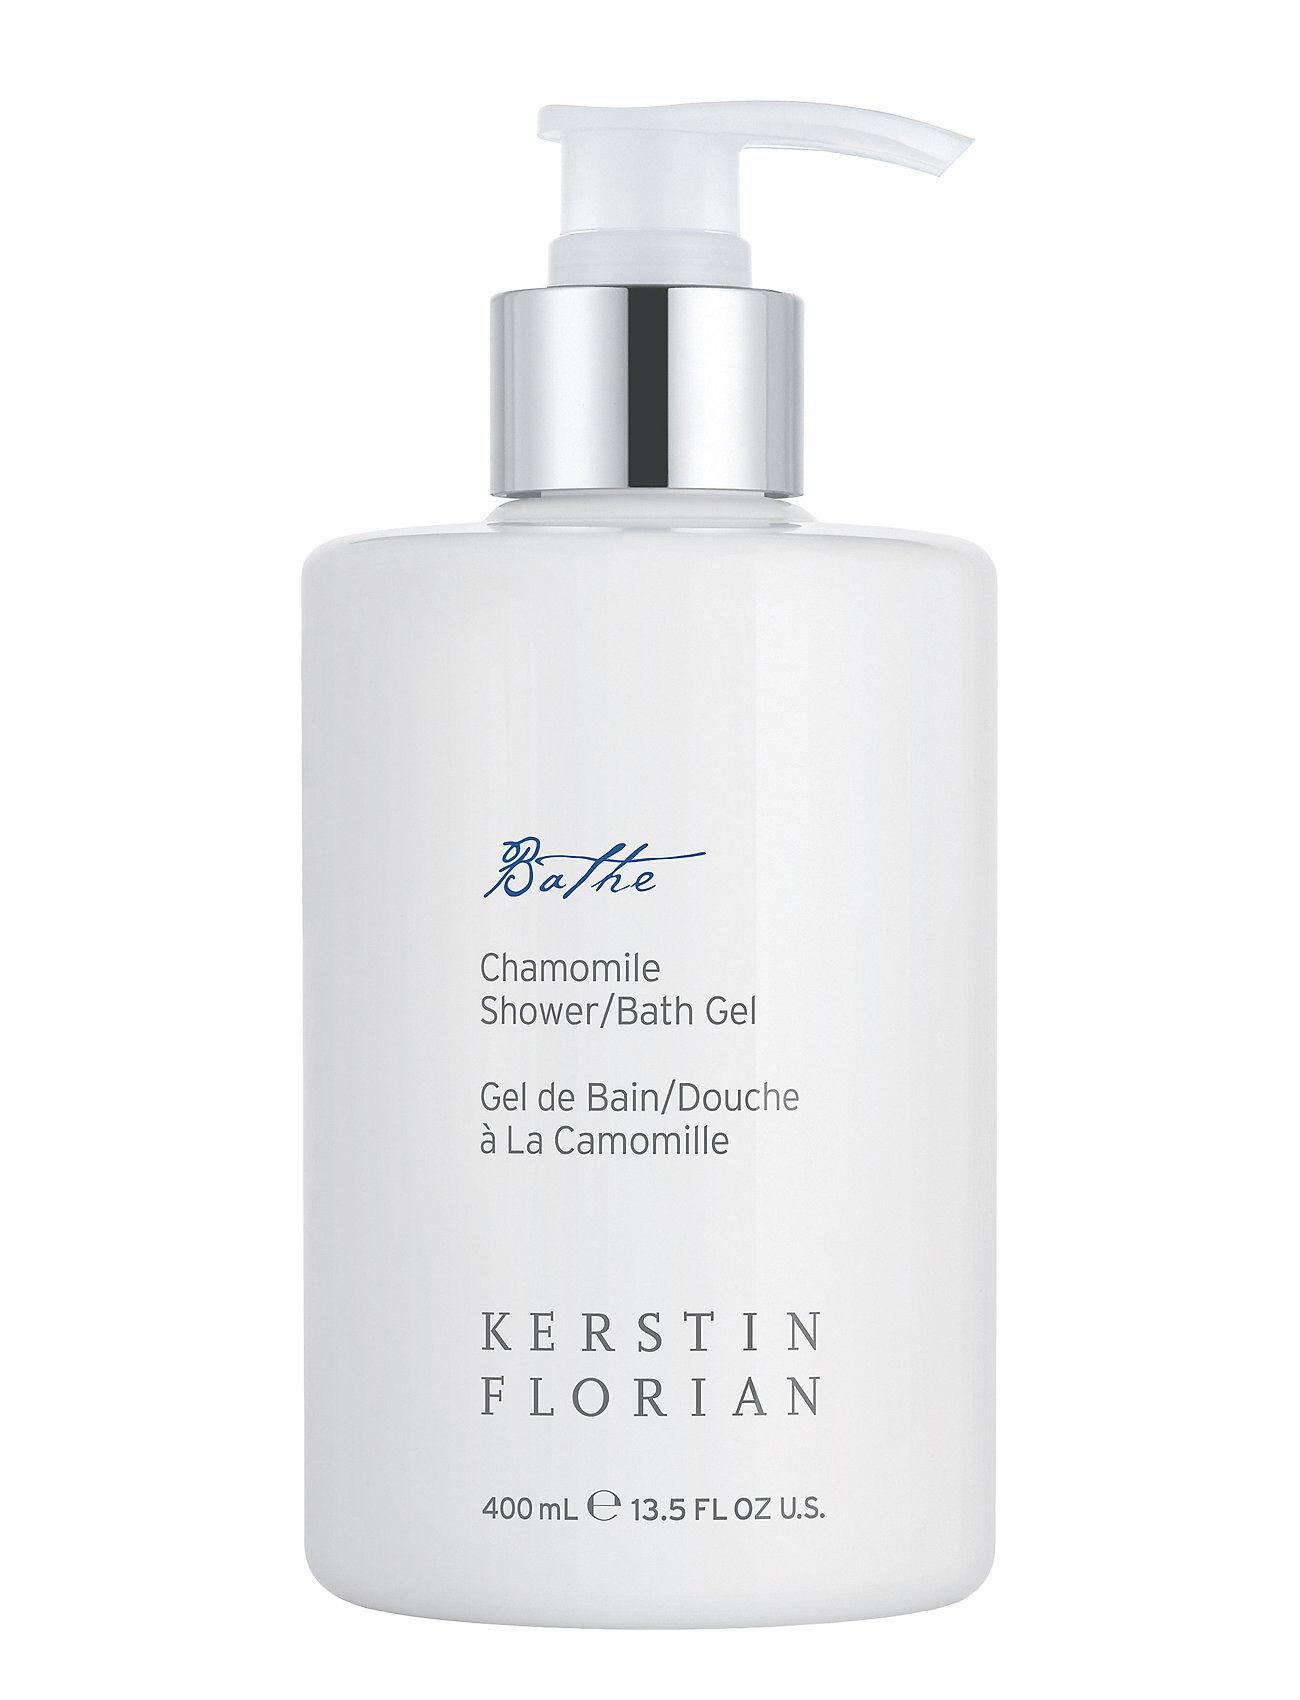 Kerstin Florian Chamomile Shower/Bath Gel